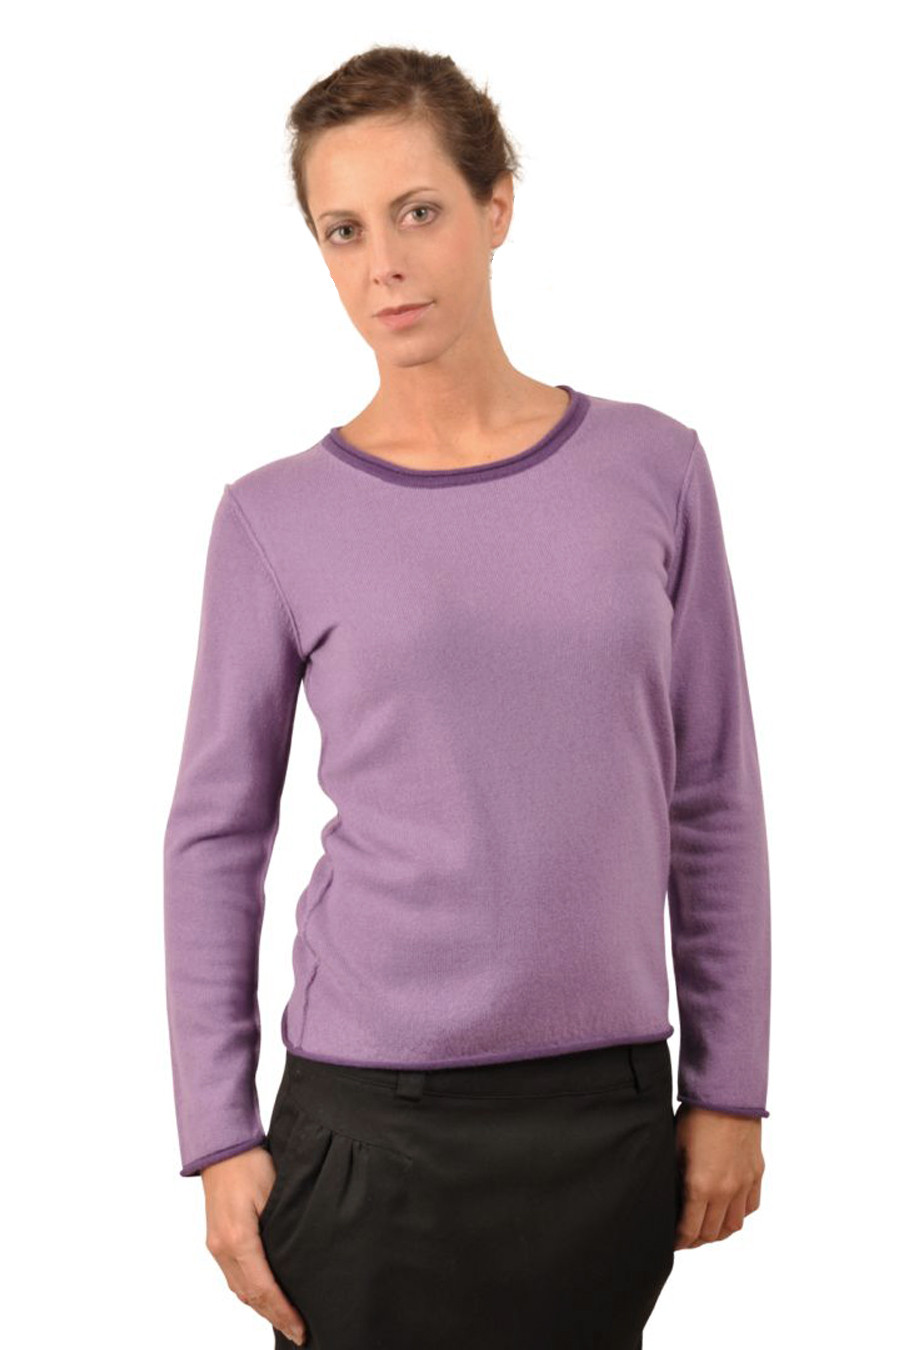 pull cachemire femme ARIANE violet devant